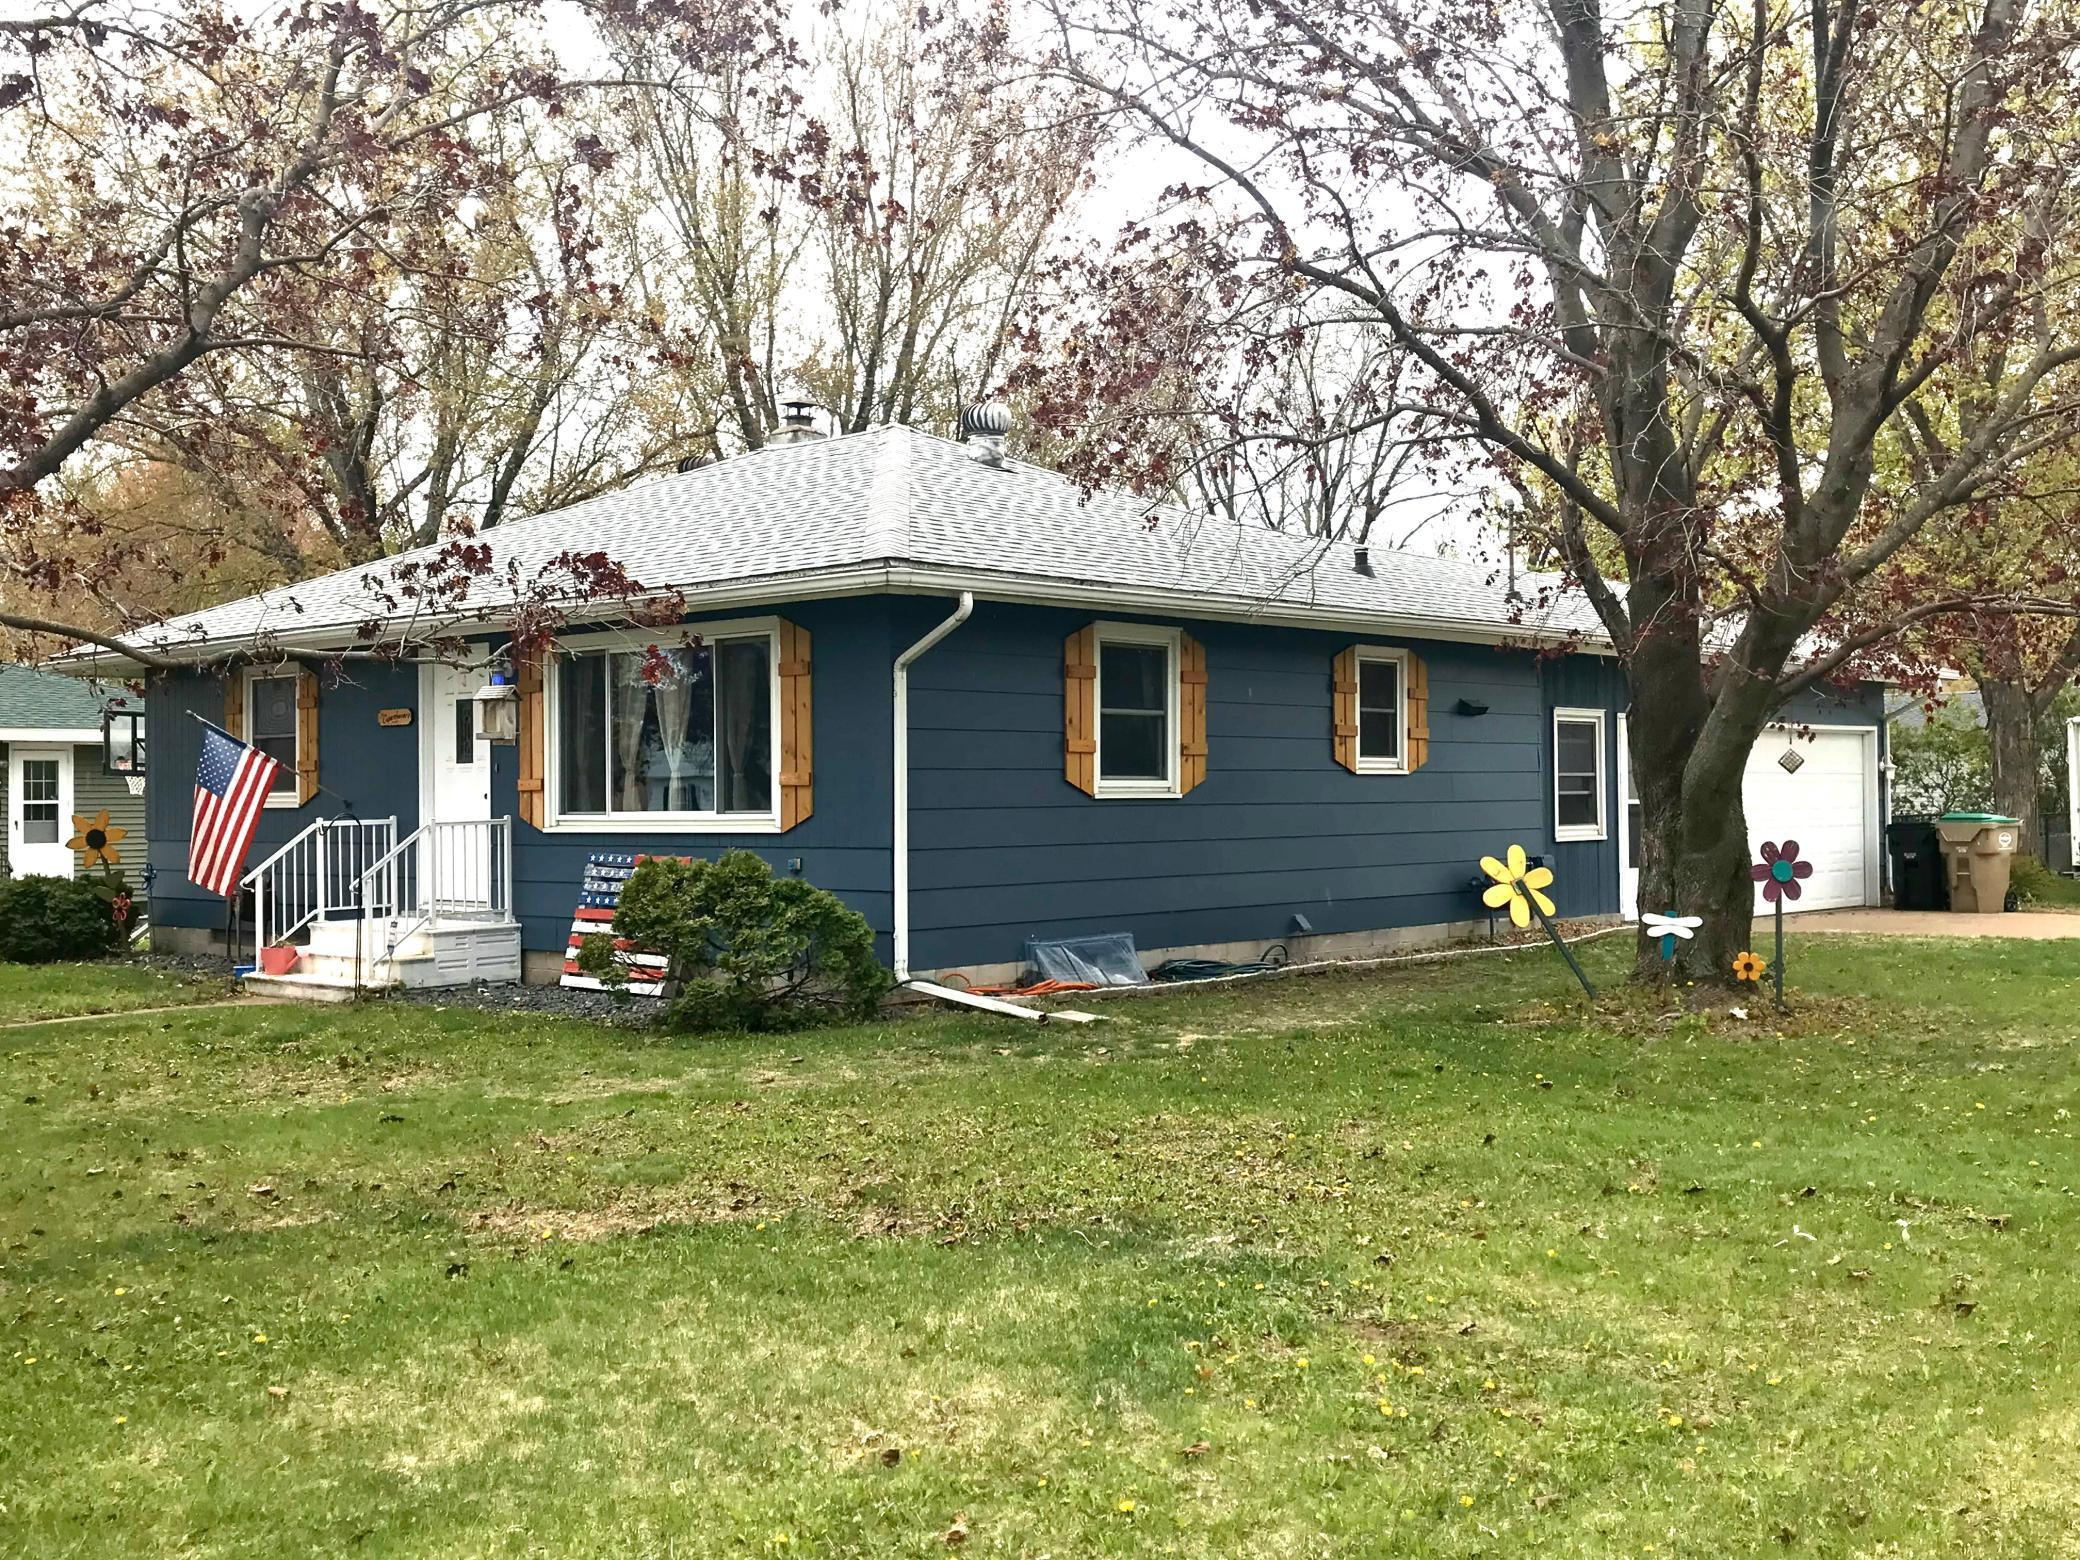 802 Woodward Property Photo - Chippewa Falls, WI real estate listing